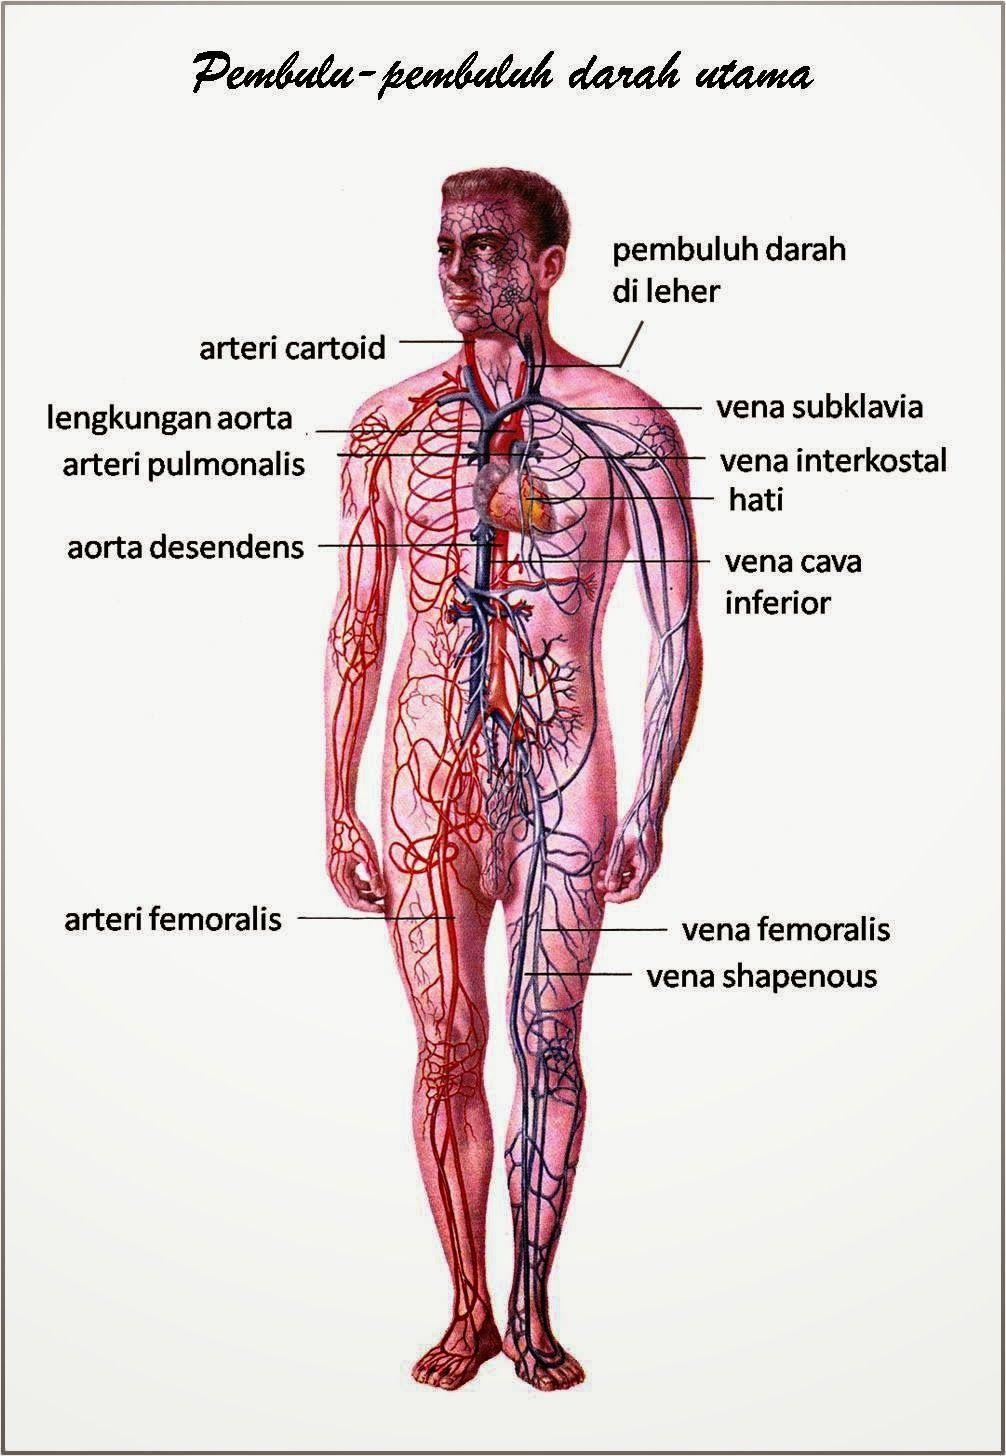 Gambar Otot Pada Manusia : gambar, manusia, SISTEM, PEREDARAN, DARAH, MANUSIA, Tubuh, Manusia,, Anatomi,, Manusia